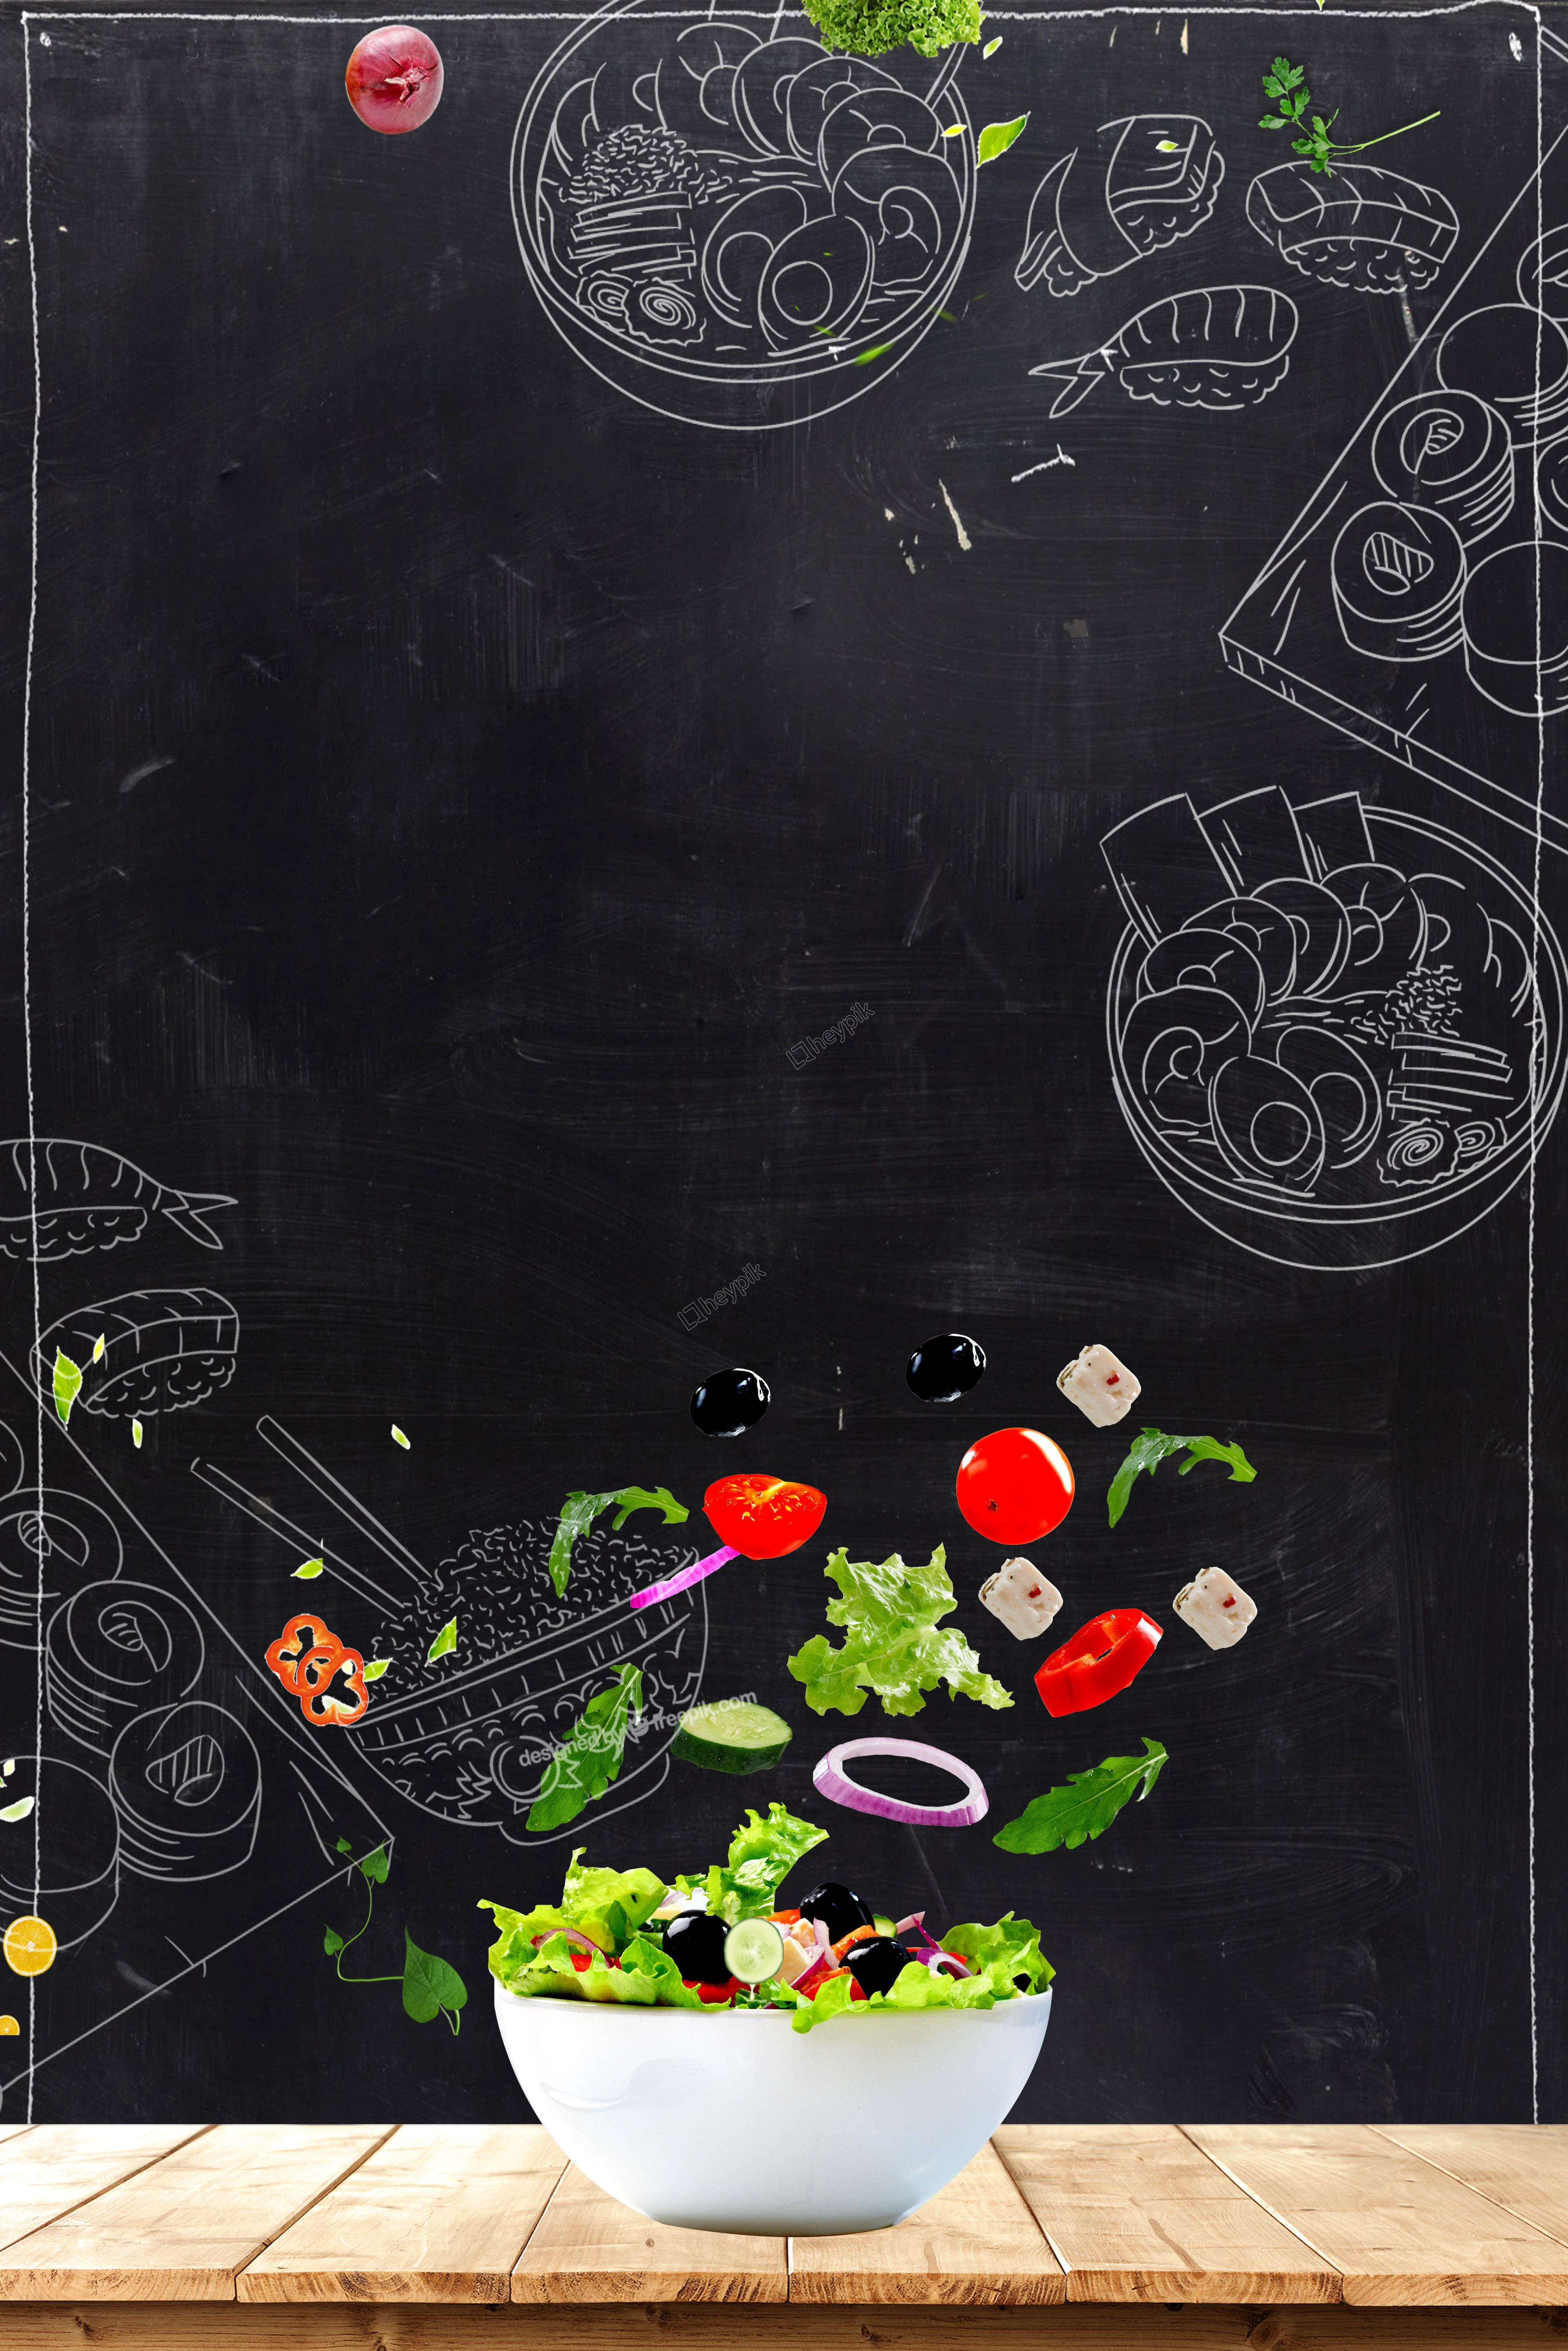 Vegetable Blackboard Creative Food Composite Advertising